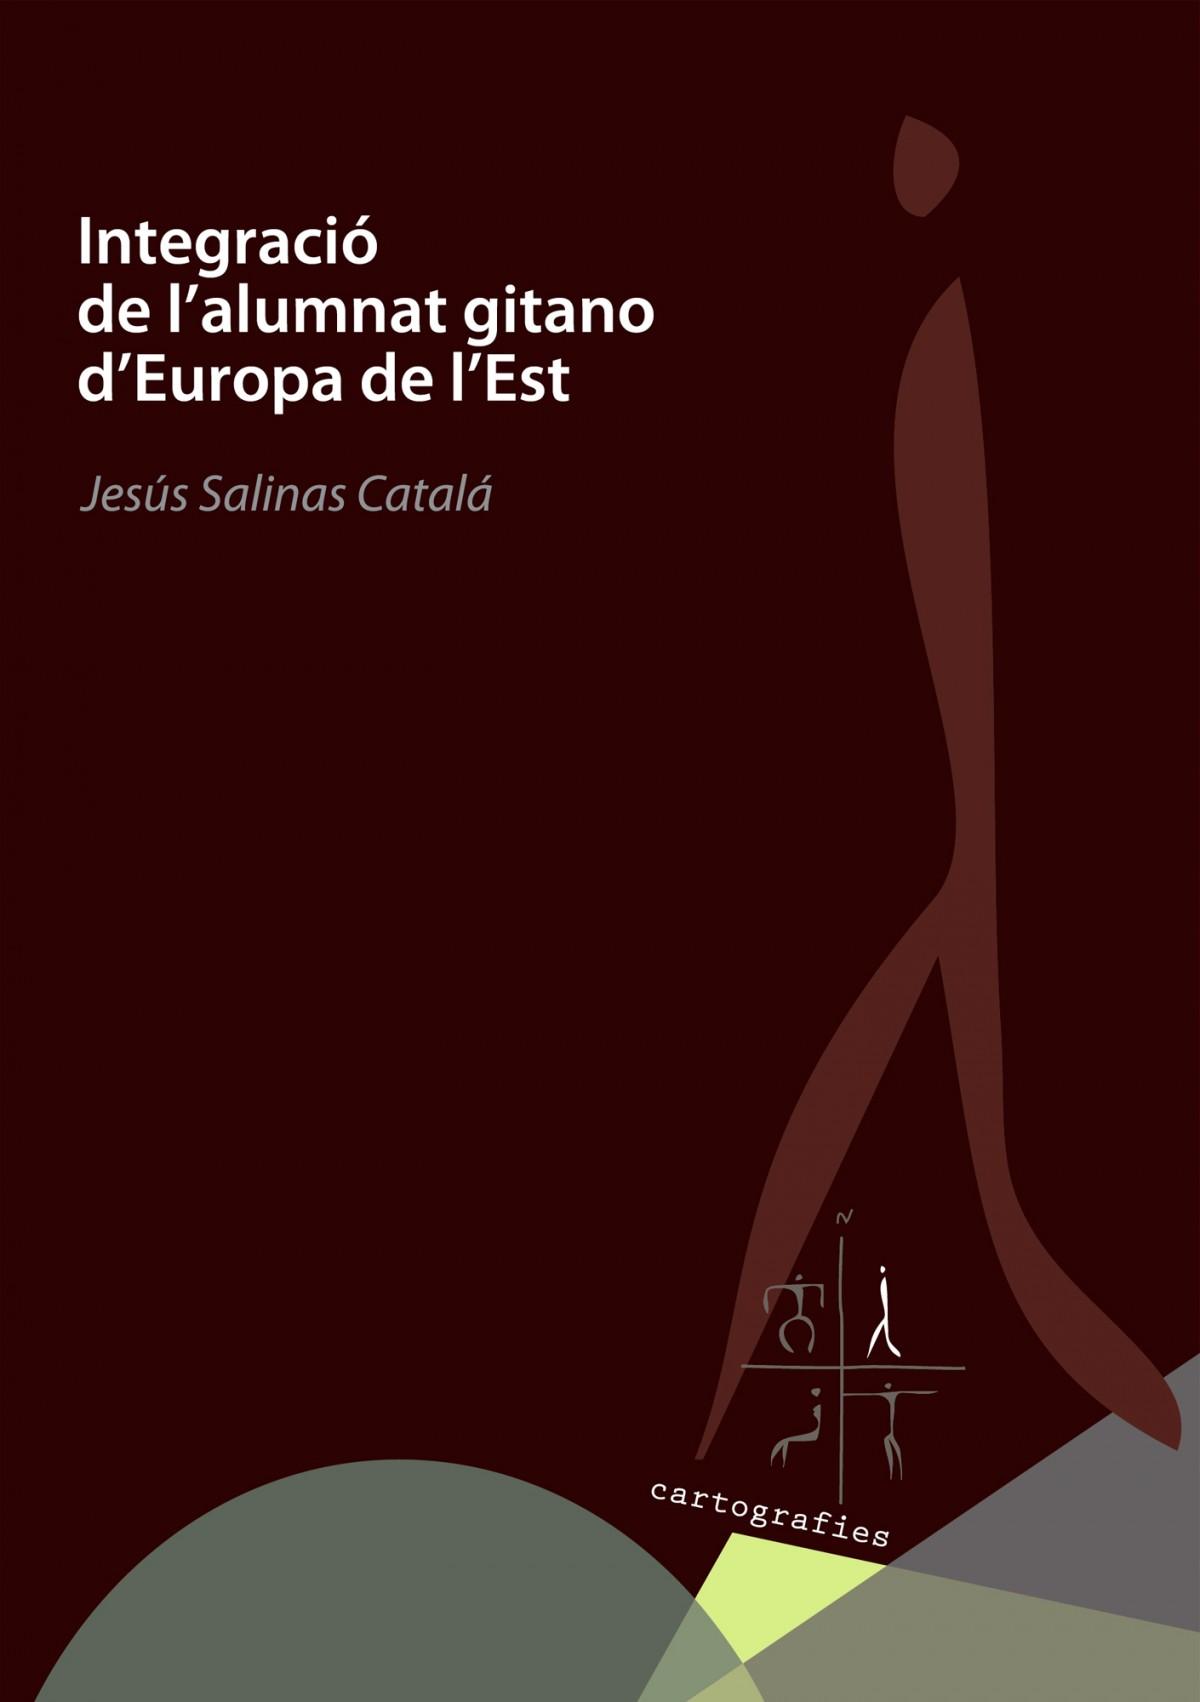 portada-2-Col-Cartografies-Periferic-disseny-Paco-Gimenez